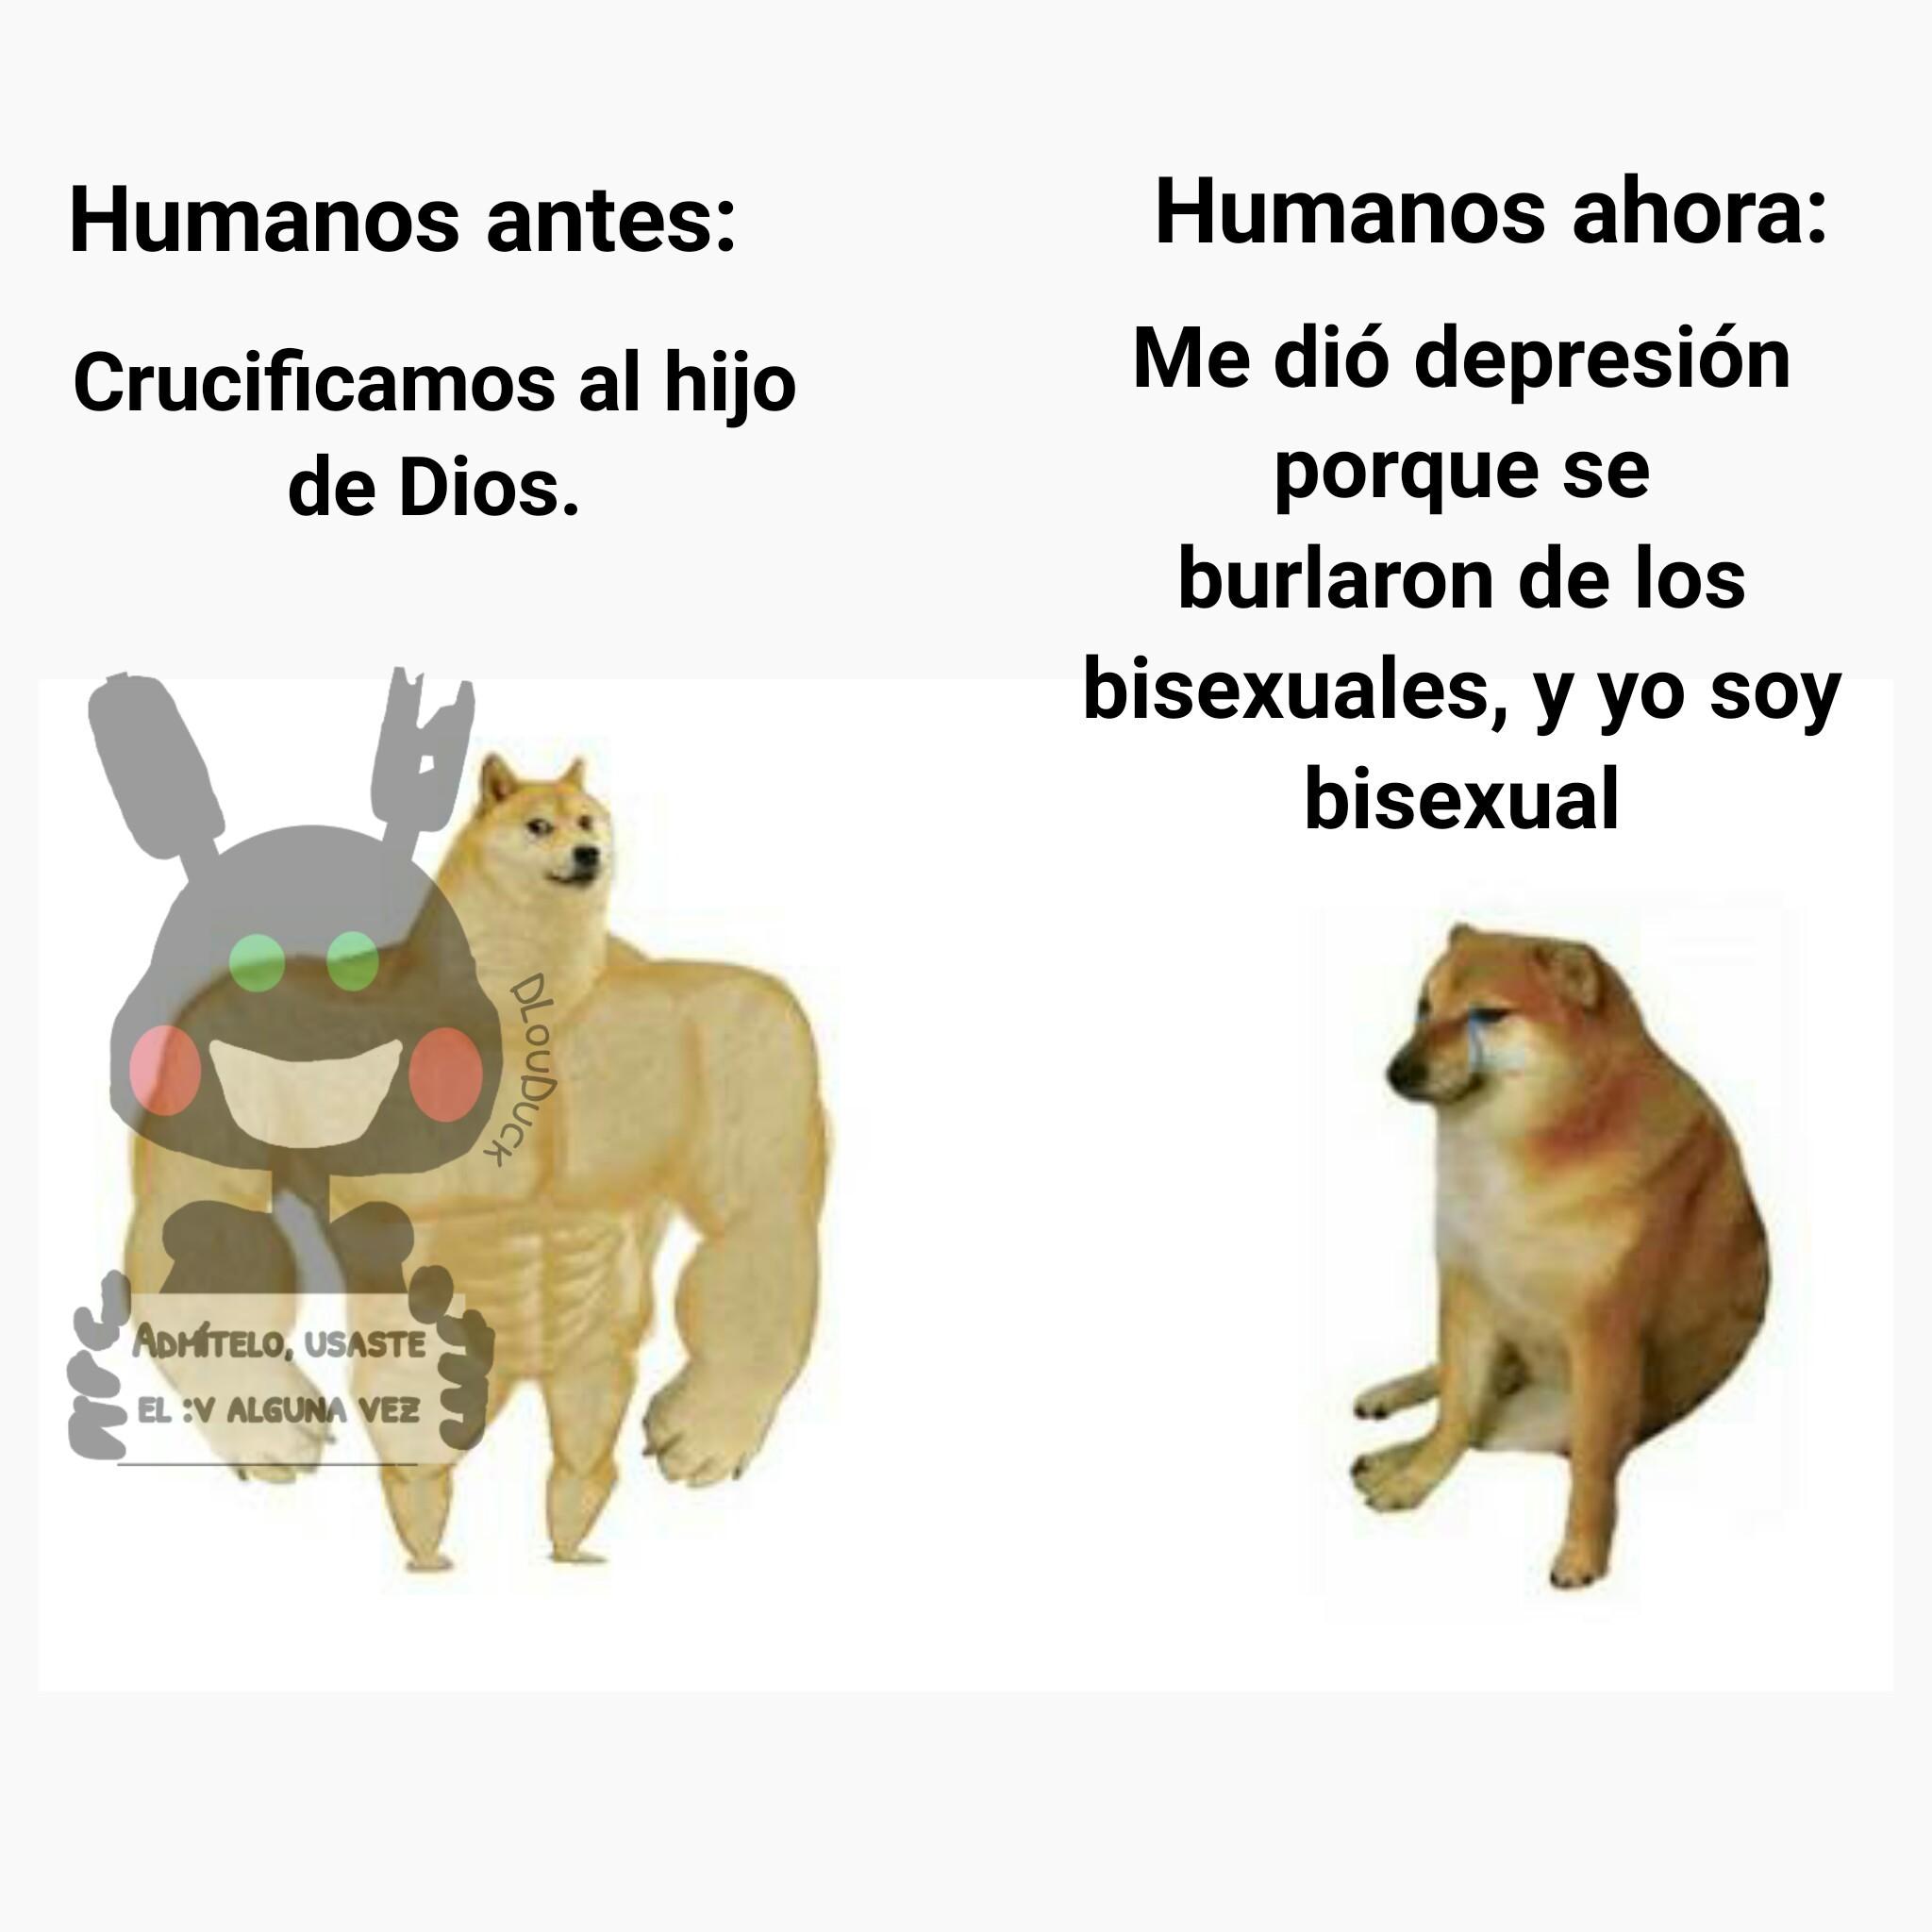 No digas tener depresión y fingir ser bisexual para sobresalir - meme